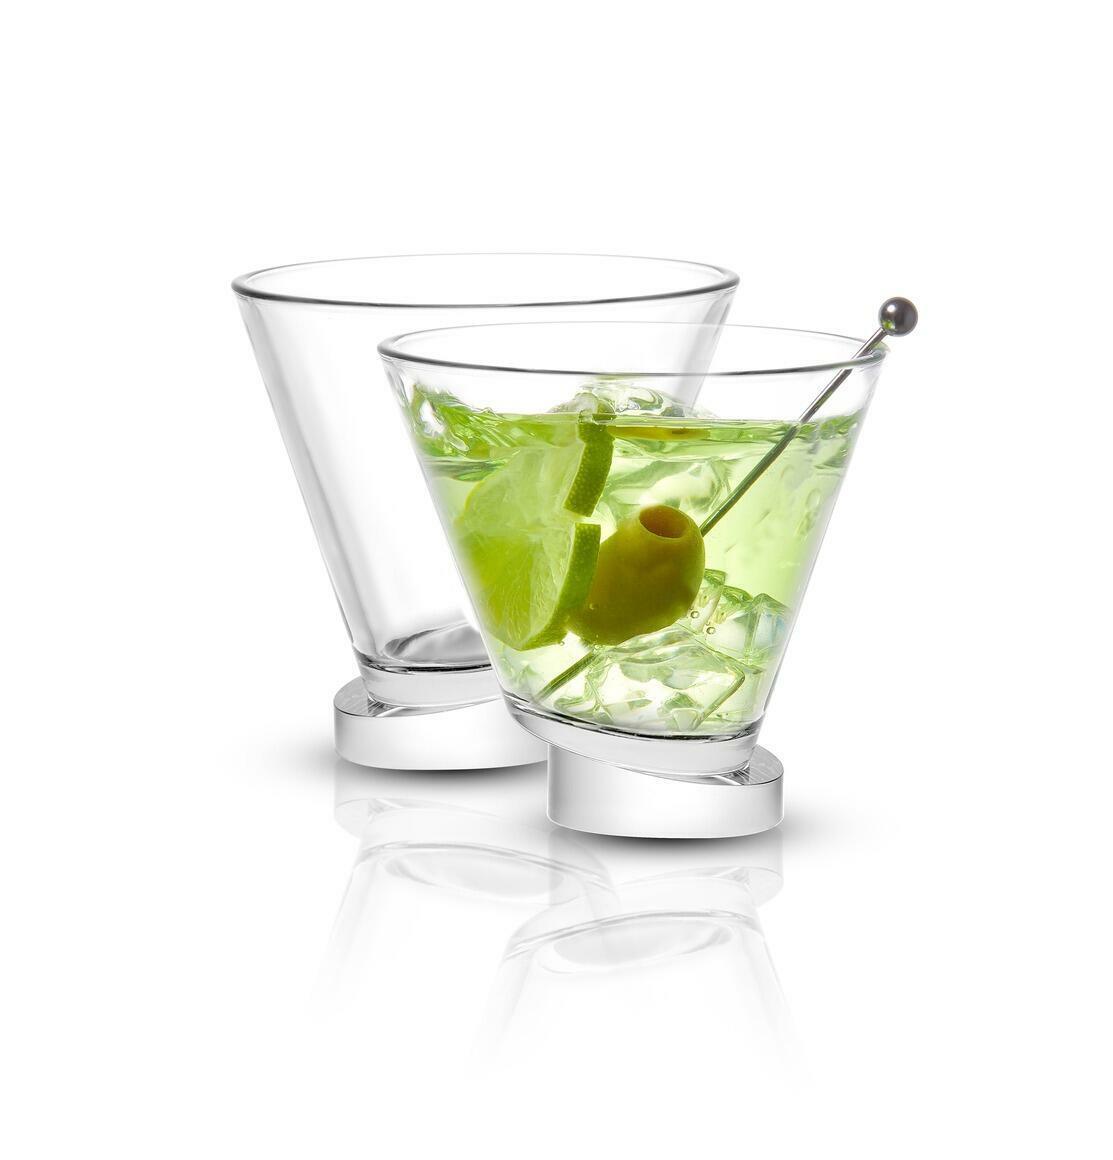 Aqua Vitae Round Crystal Martini Glass, 8.6oz (Set of 2)  | Trada Marketplace